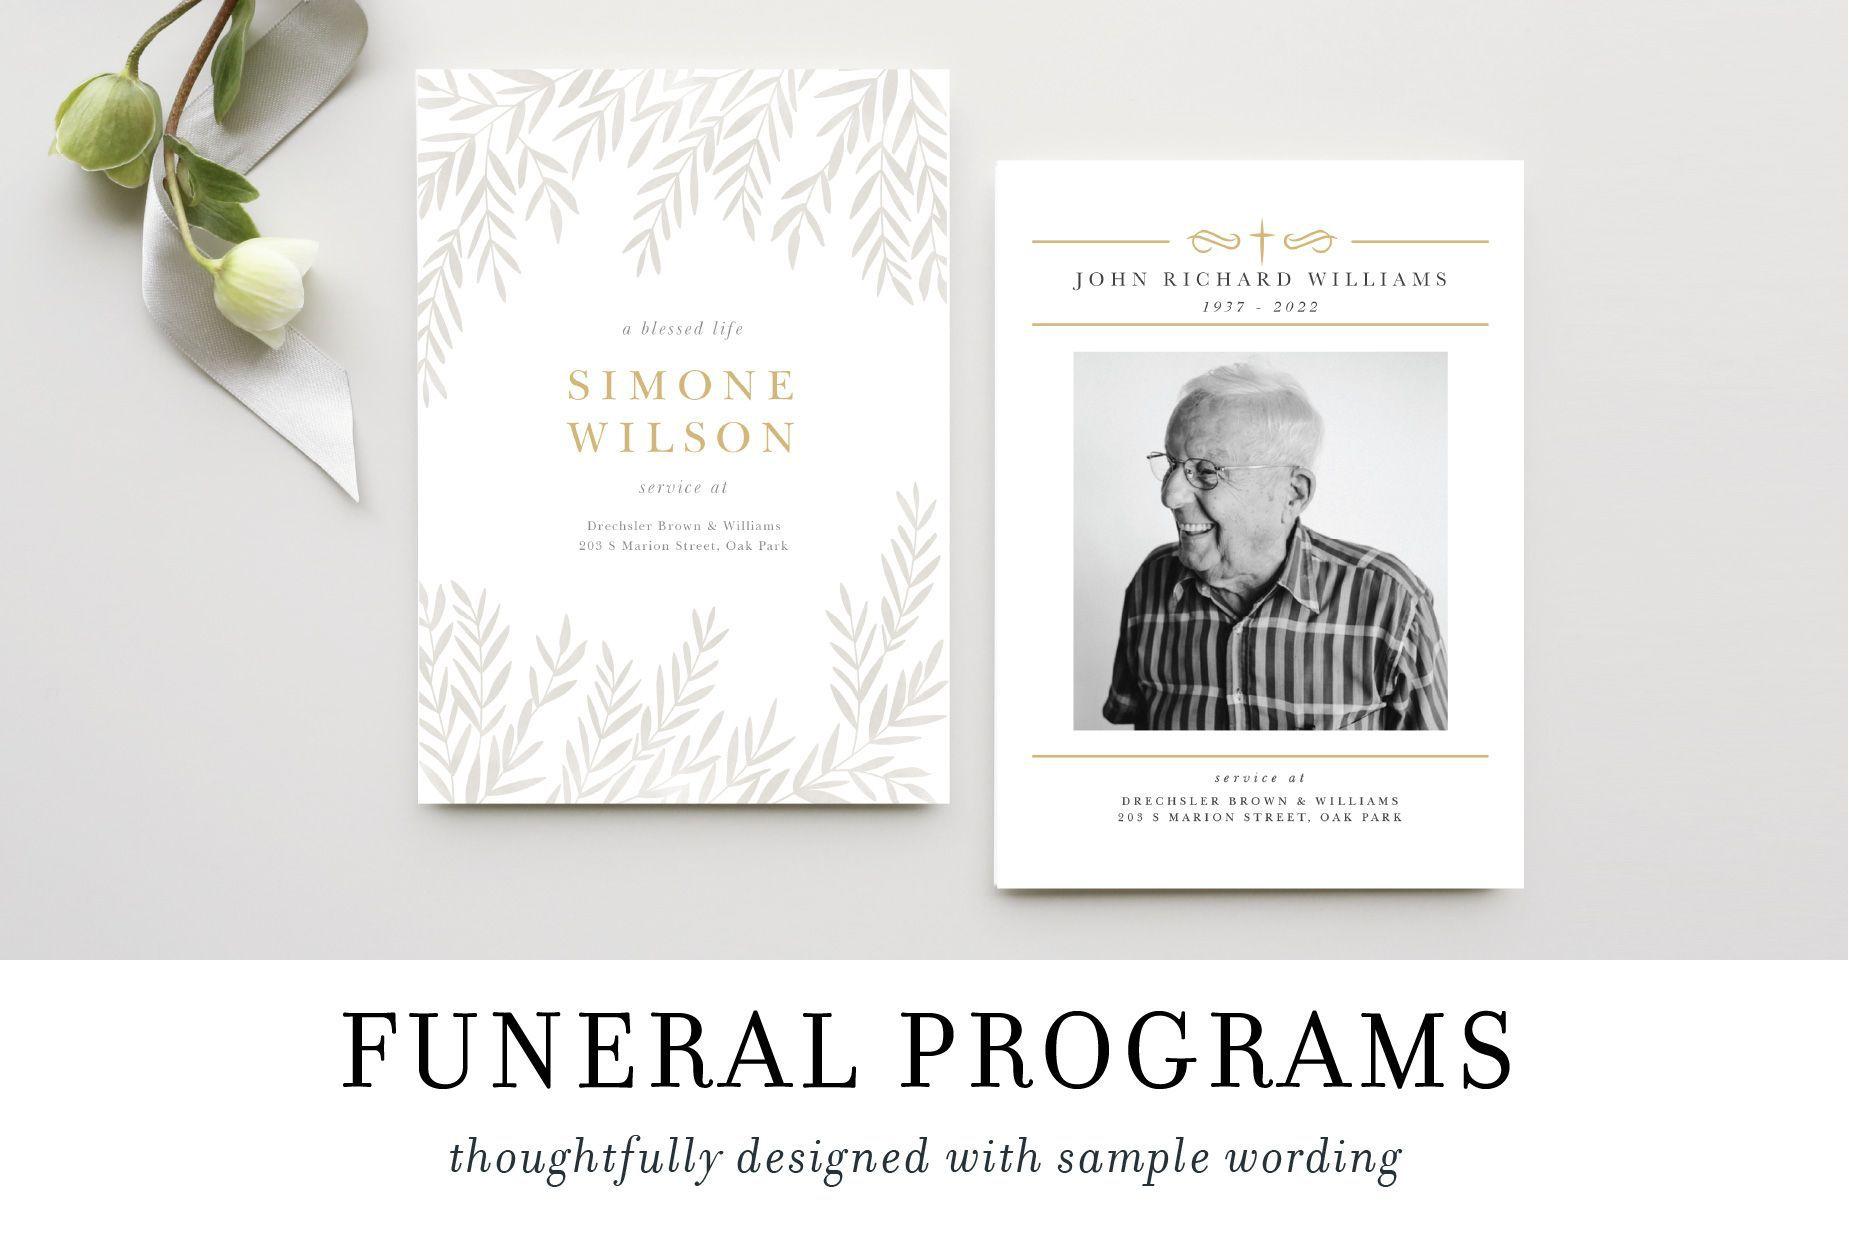 009 Fearsome Sample Wording For Funeral Program Idea  ProgramsFull